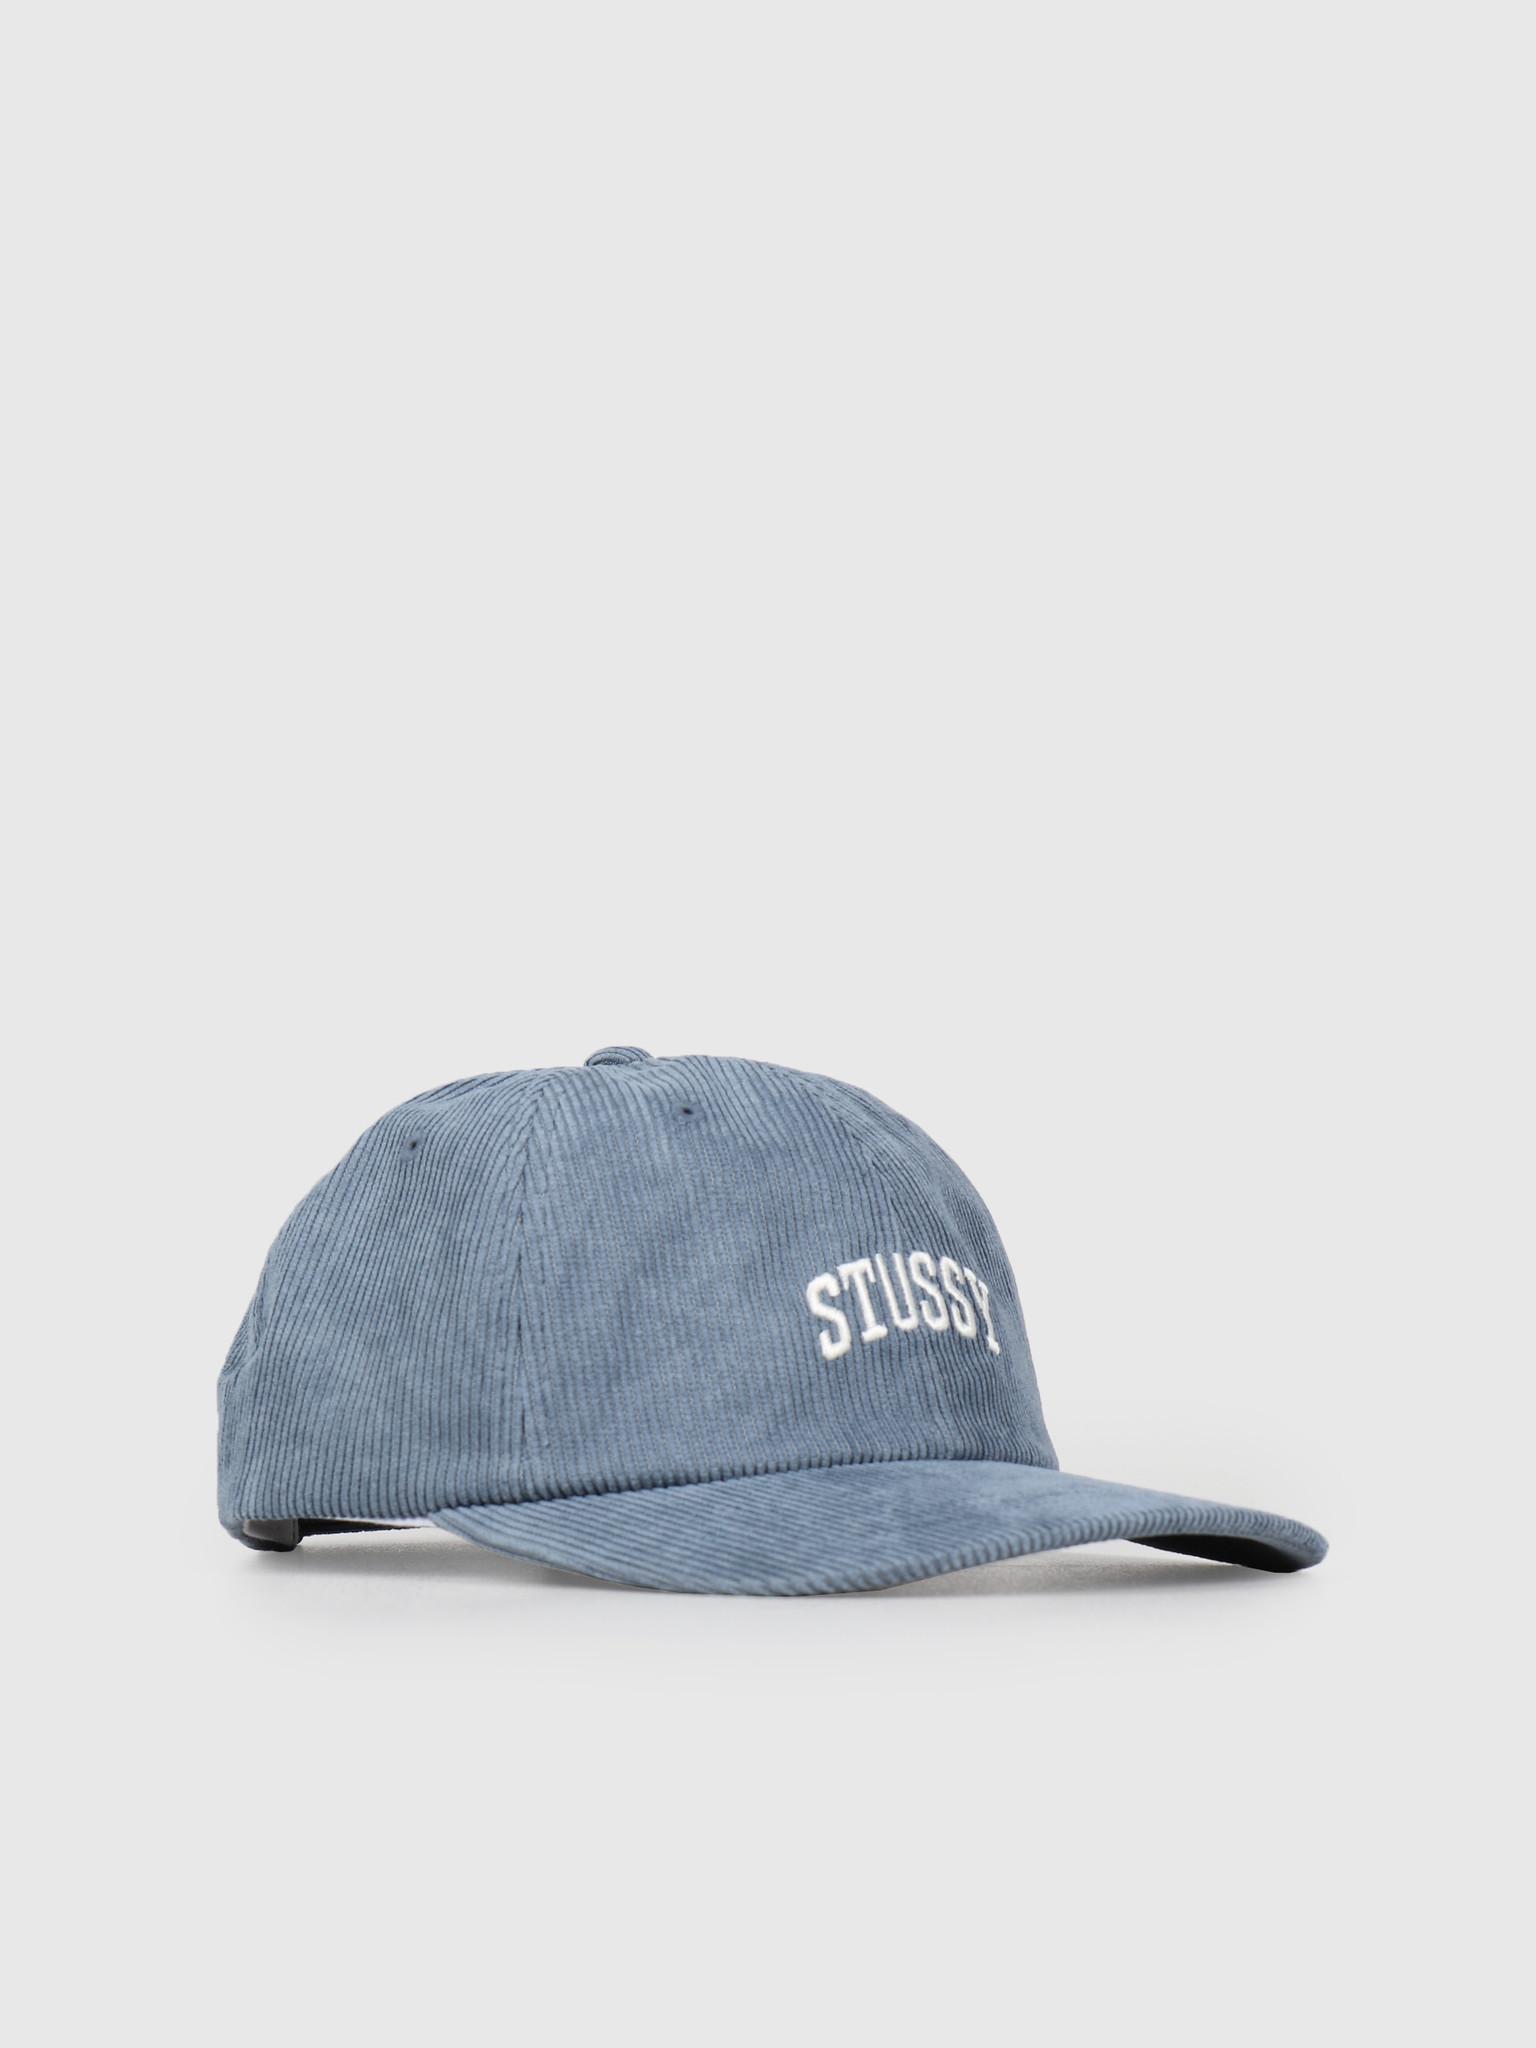 Stussy Stussy Cord Low Pro Cap Blue 0801